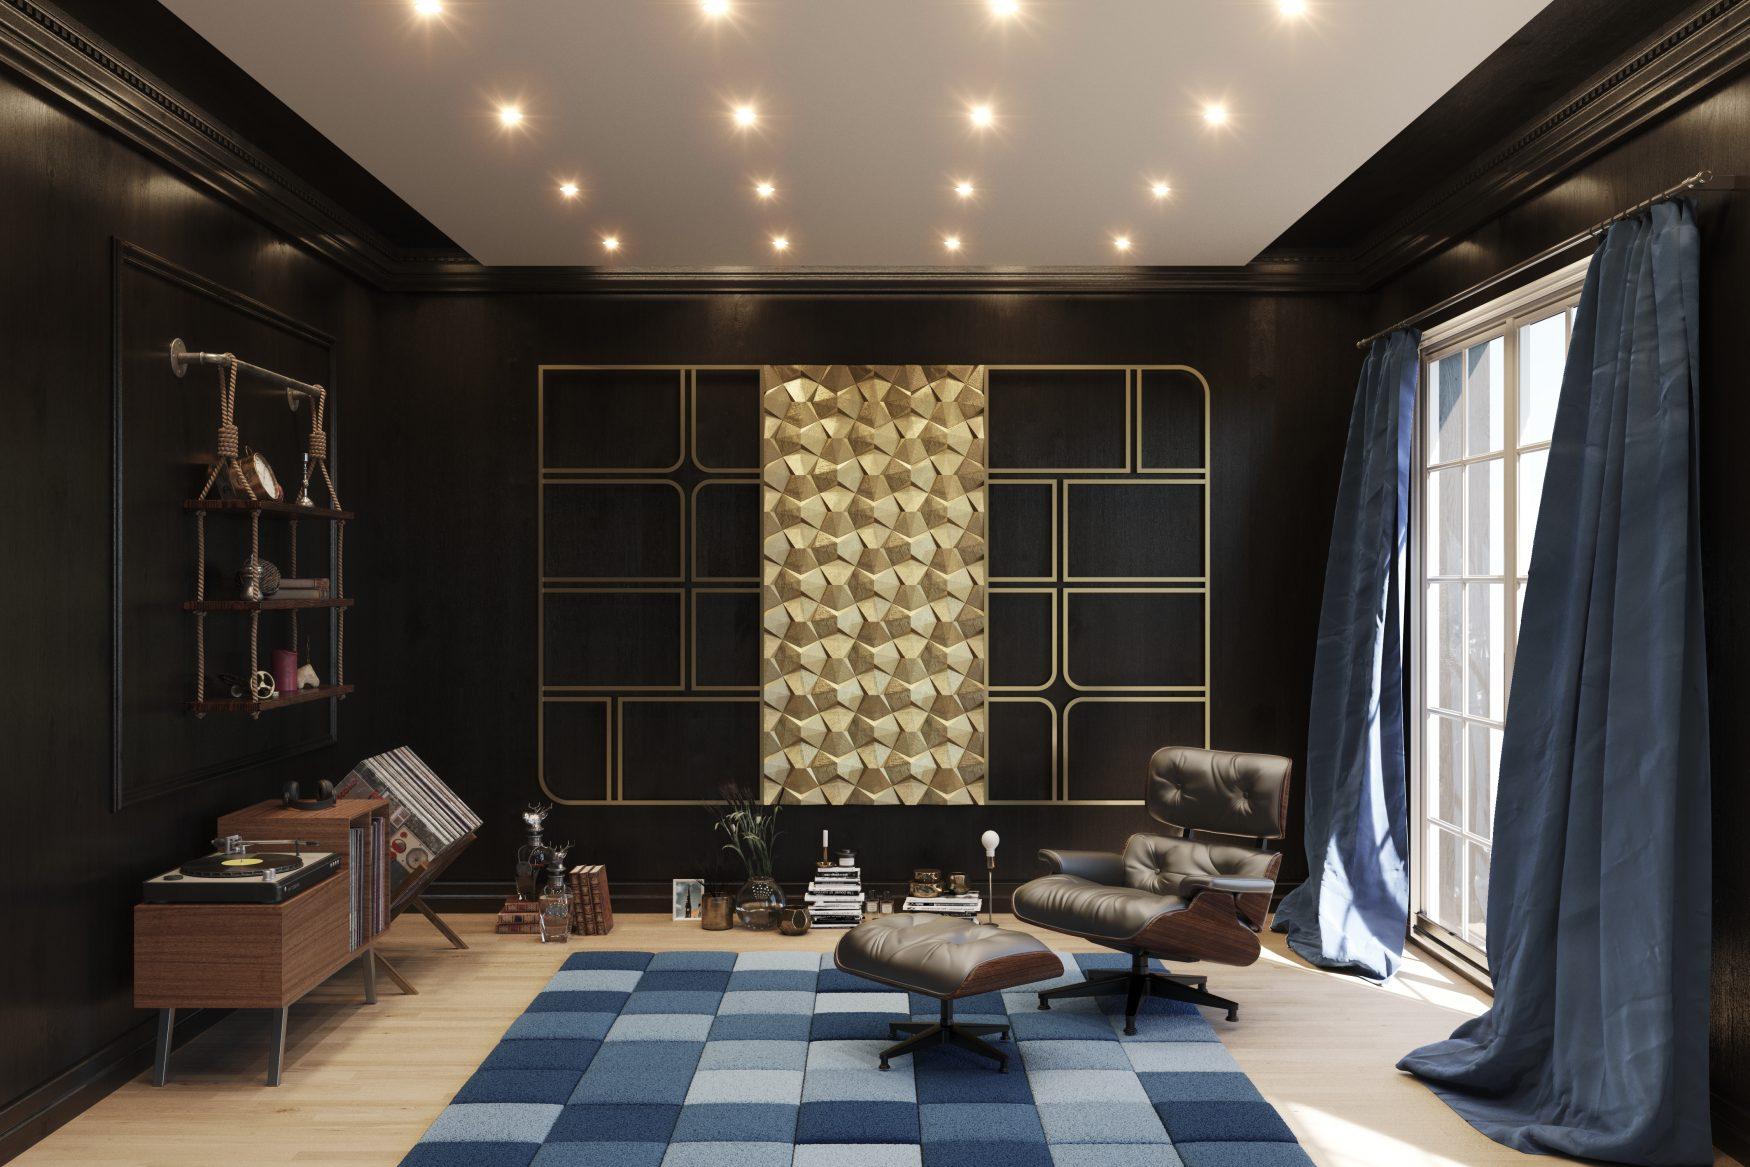 Okiun-9-elegant-salon-e1549897853859